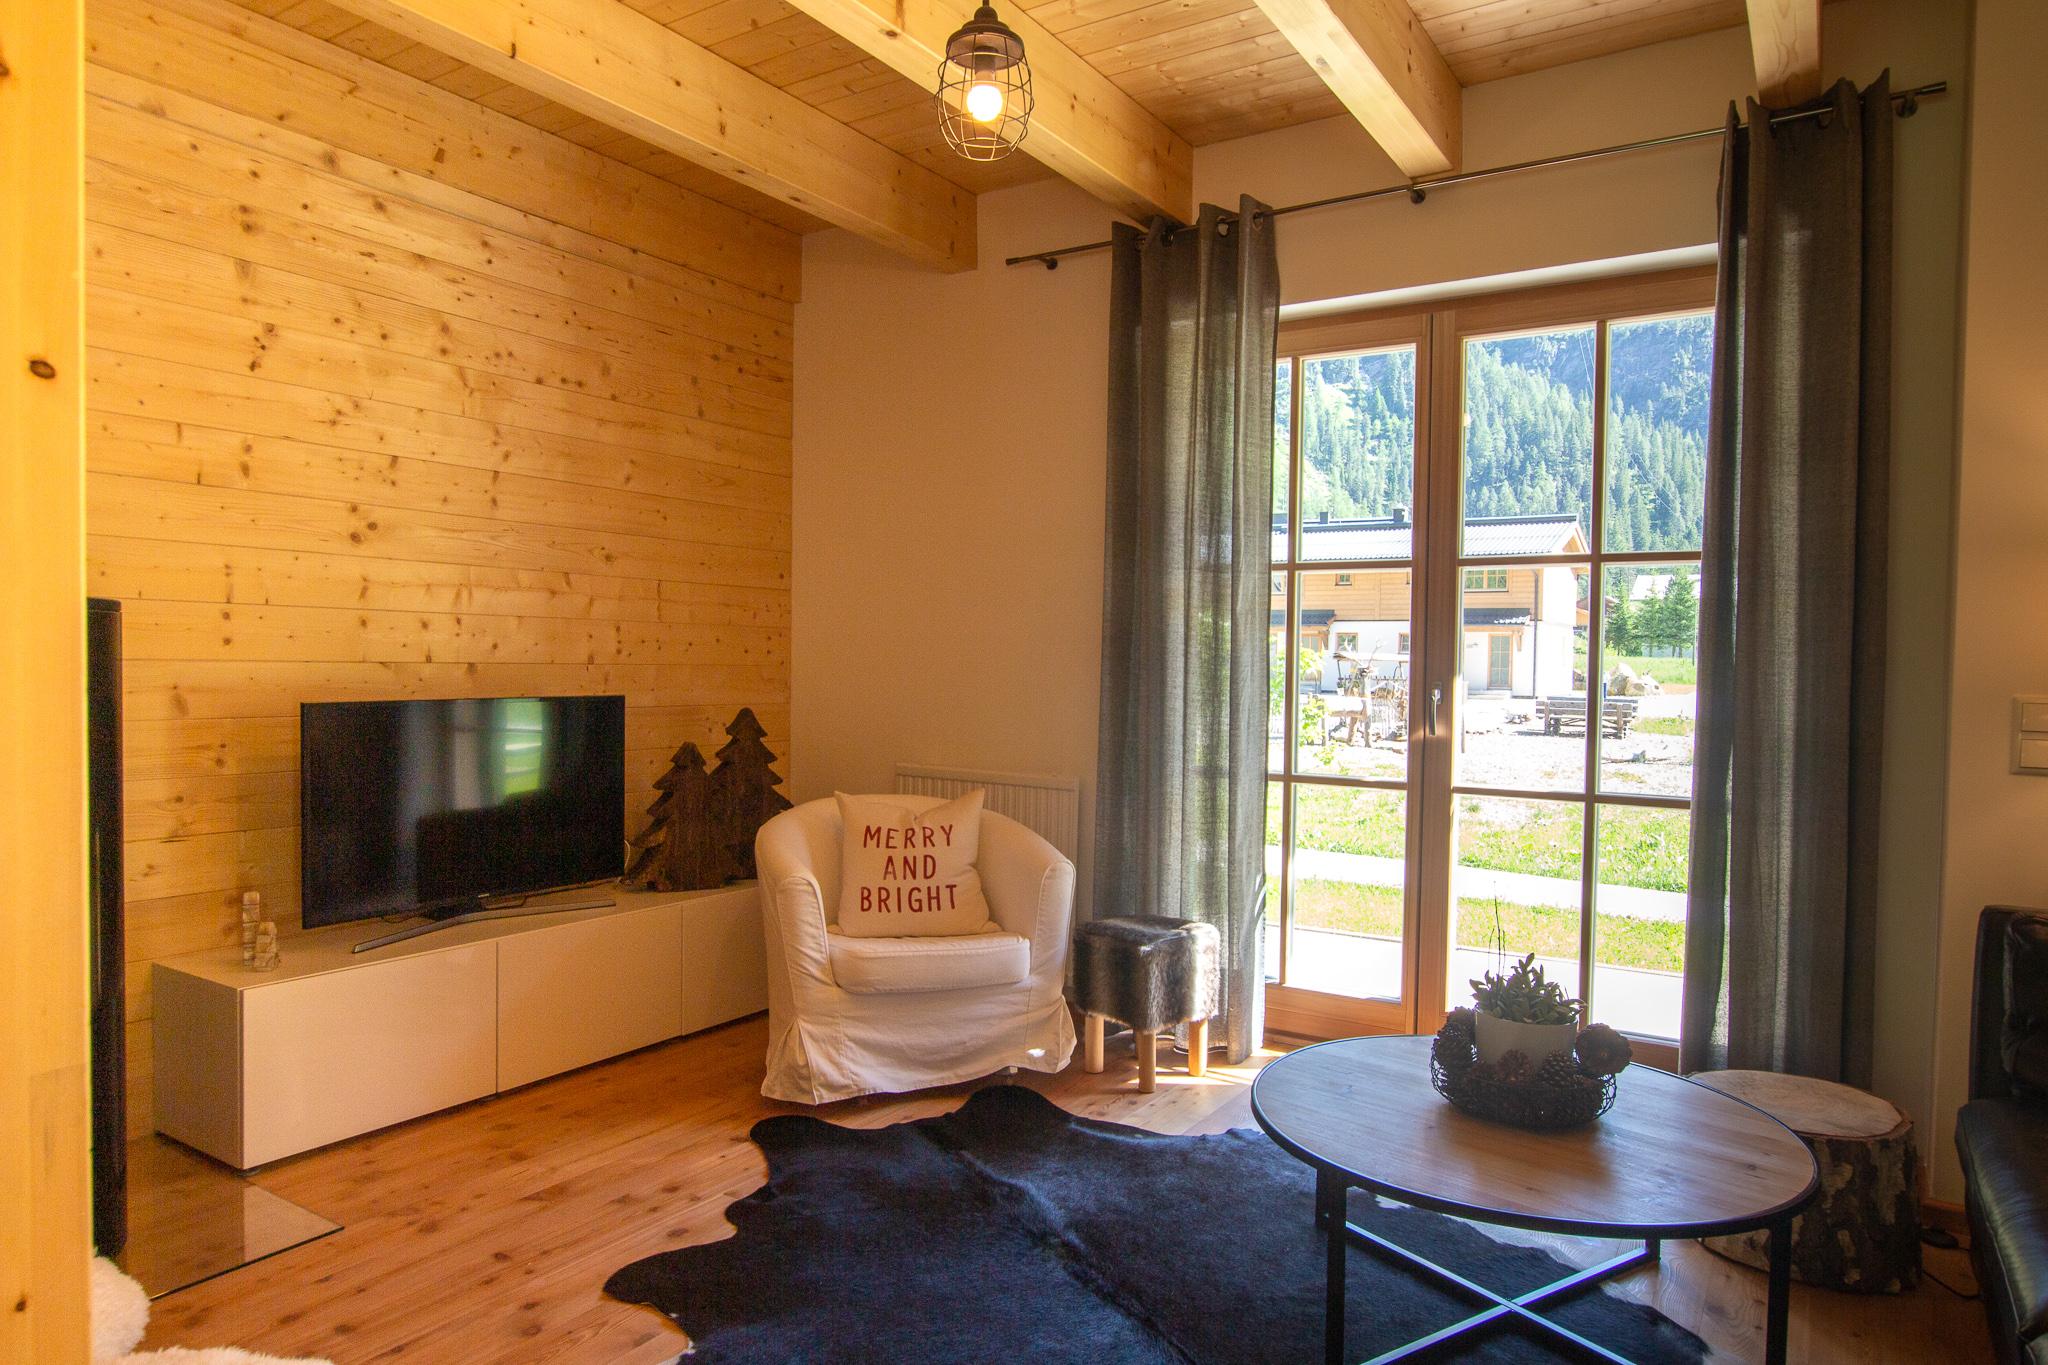 Maison de vacances Lodge Seeblick am Skilift und Bergsee für 5 (2636751), Uttendorf, Pinzgau, Salzbourg, Autriche, image 22